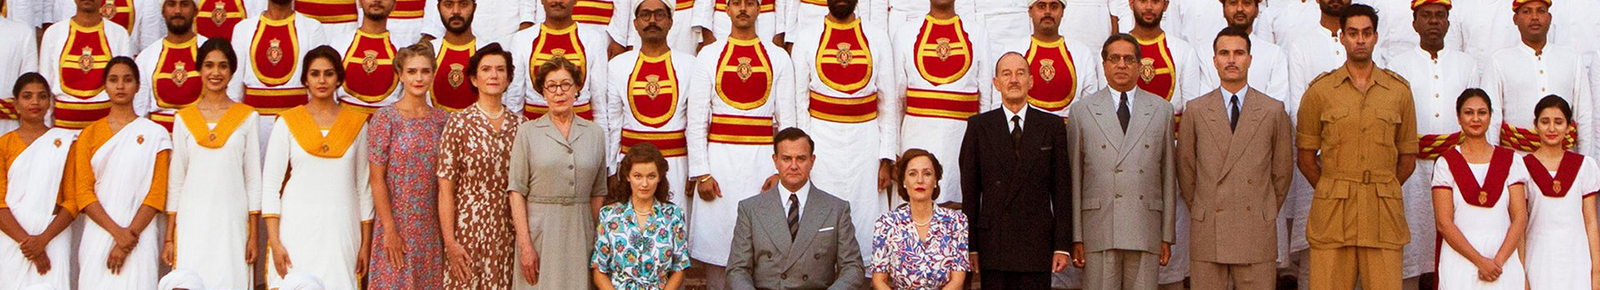 Sydney Film Festival Presents Viceroy's House